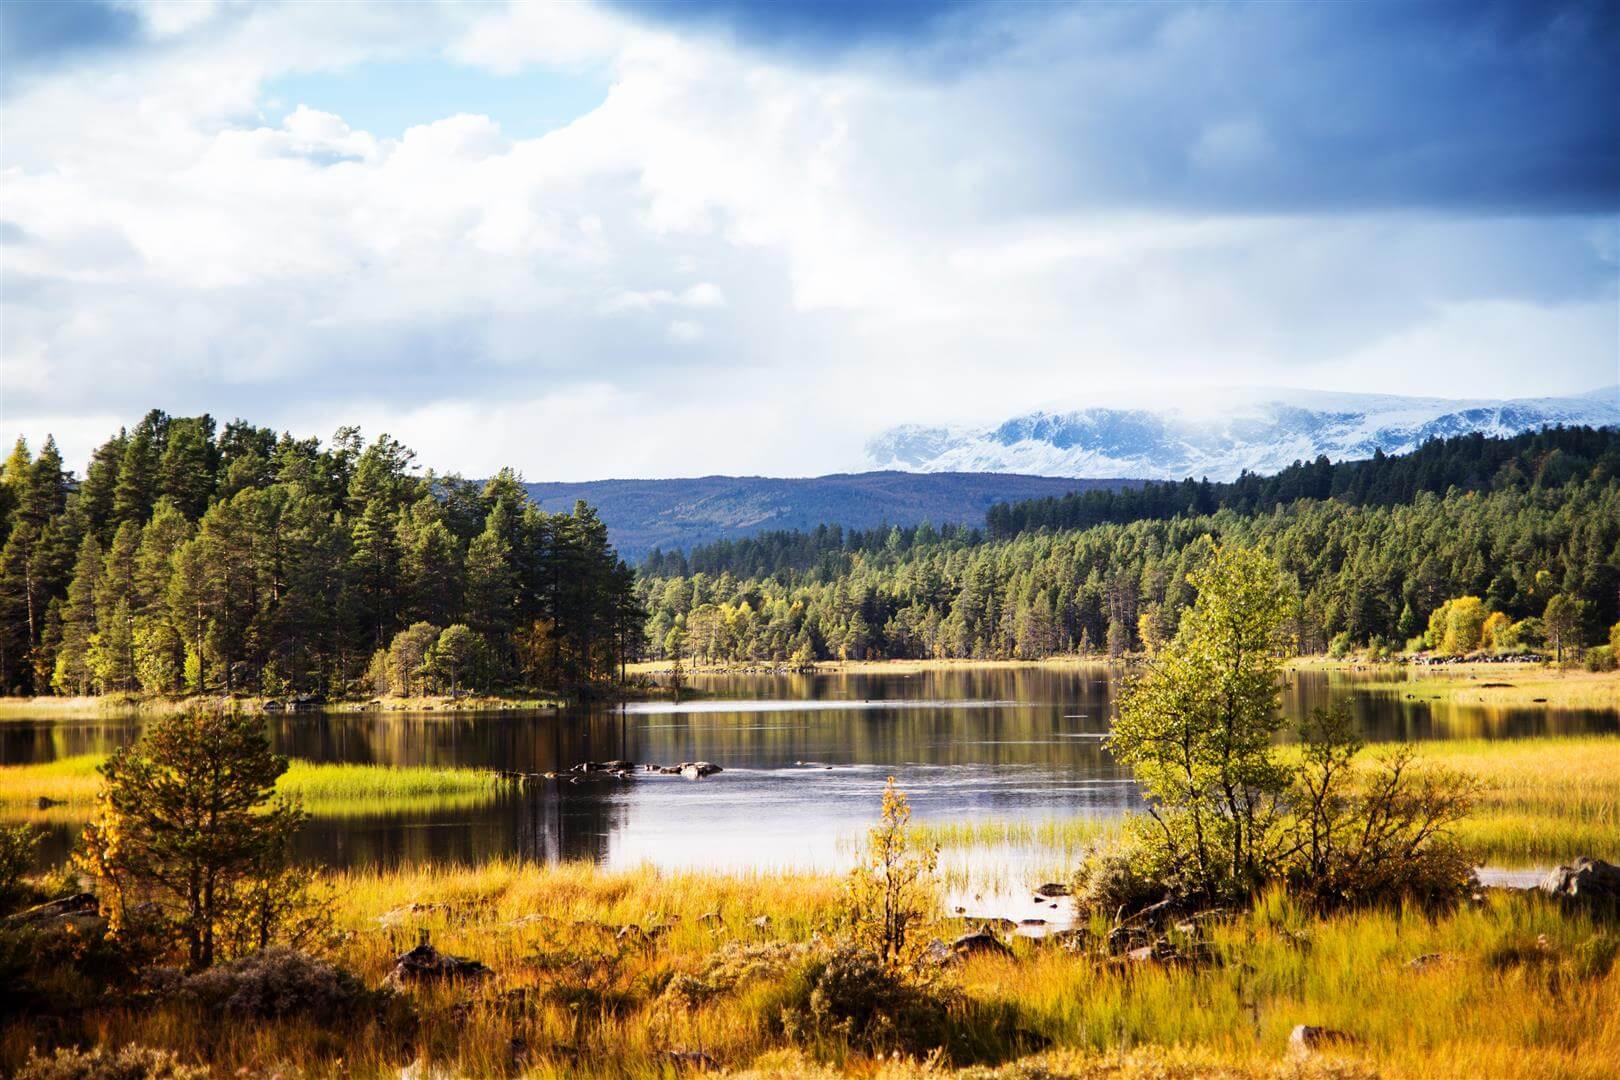 Dagali og områdene rundt Hardangervidda og Hallingskarvet byr på uendelige muligheter for friluftsliv